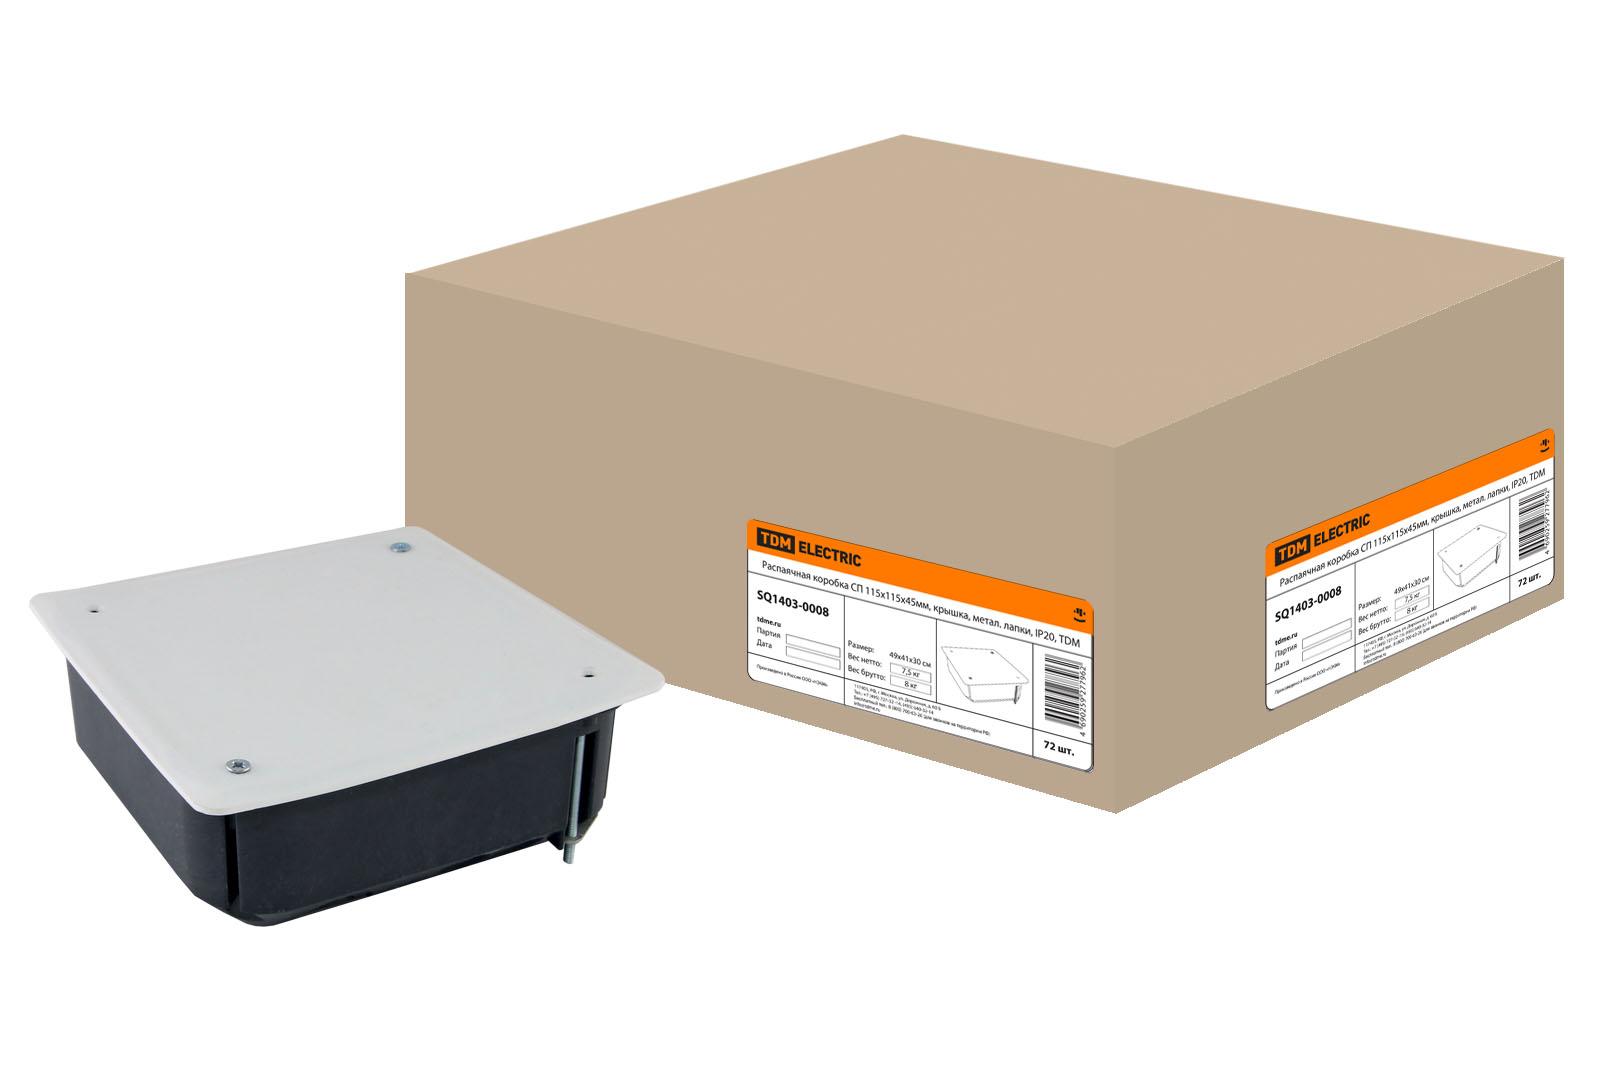 Фото Распаячная коробка СП 115х115х45мм, крышка, метал. лапки, IP20, TDM {SQ1403-0008}